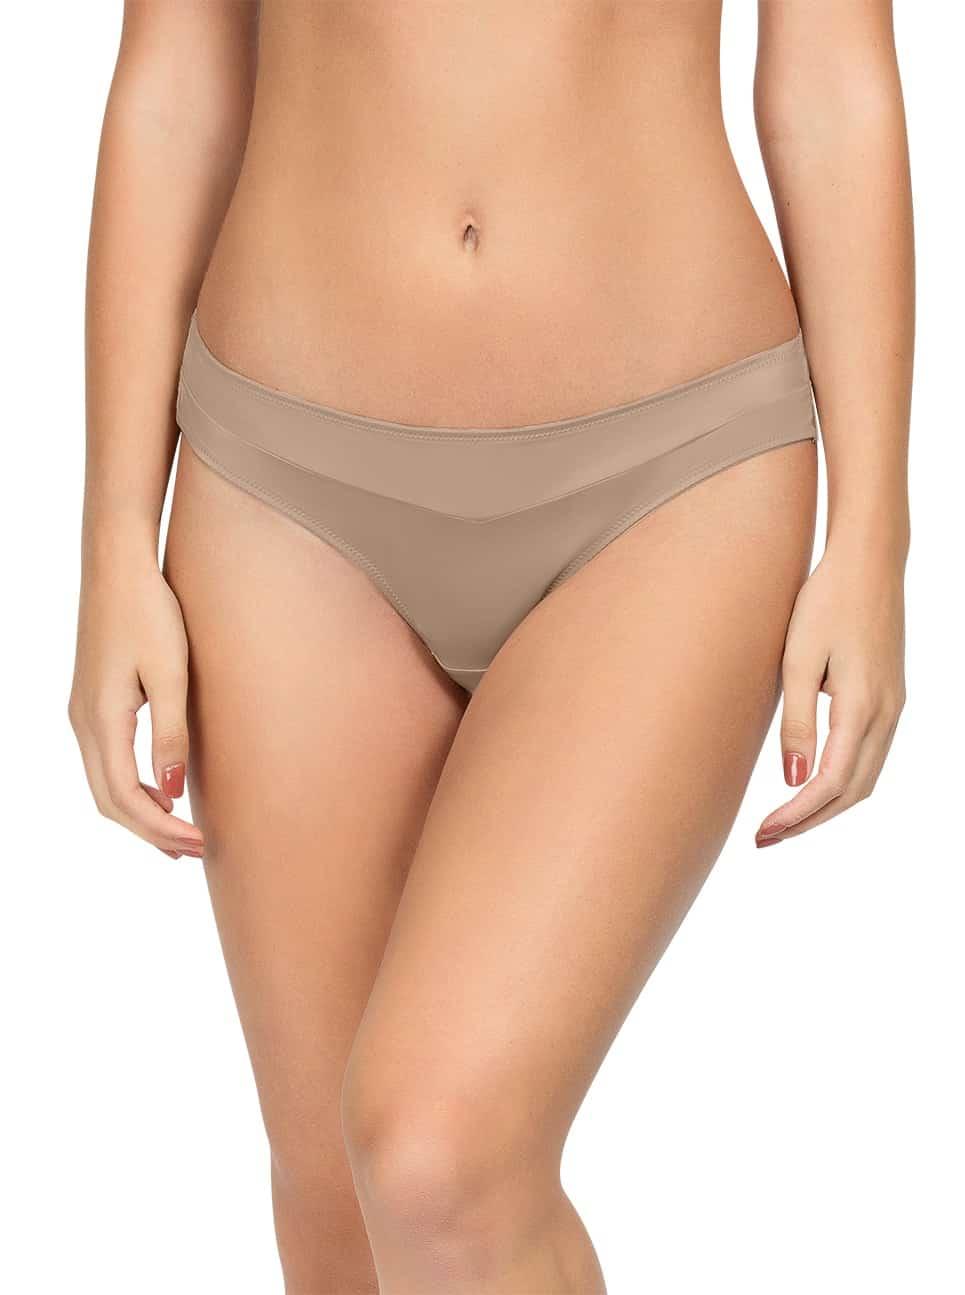 Nouveau Brazilian Thong – European Nude – A1534 1